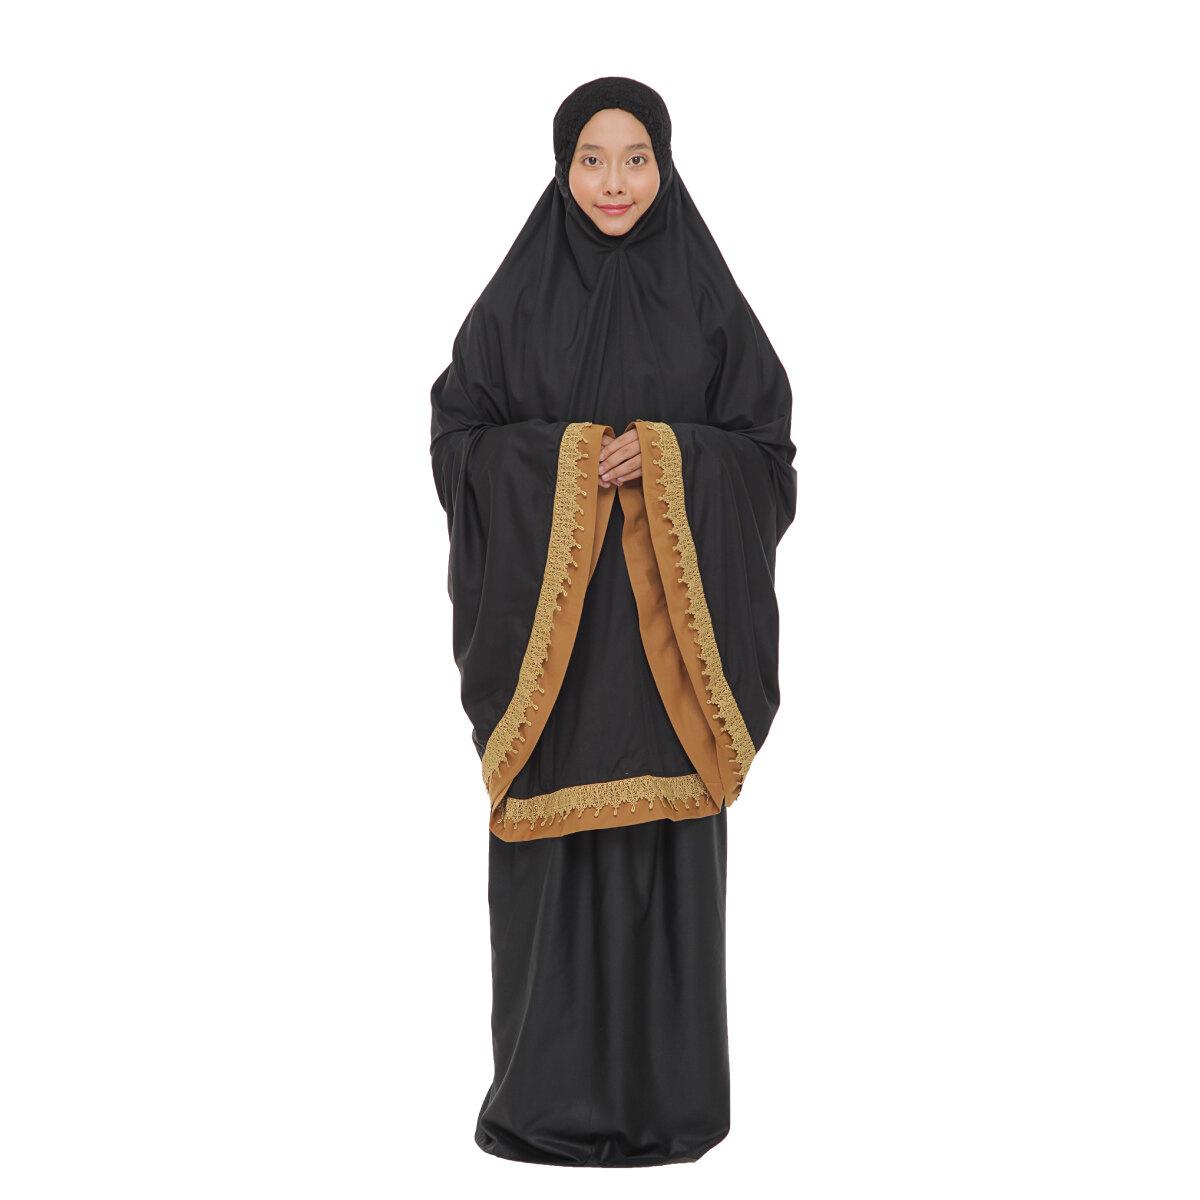 Telekung Siti Khadijah Classic TPO Ufaira in Black (One Set)